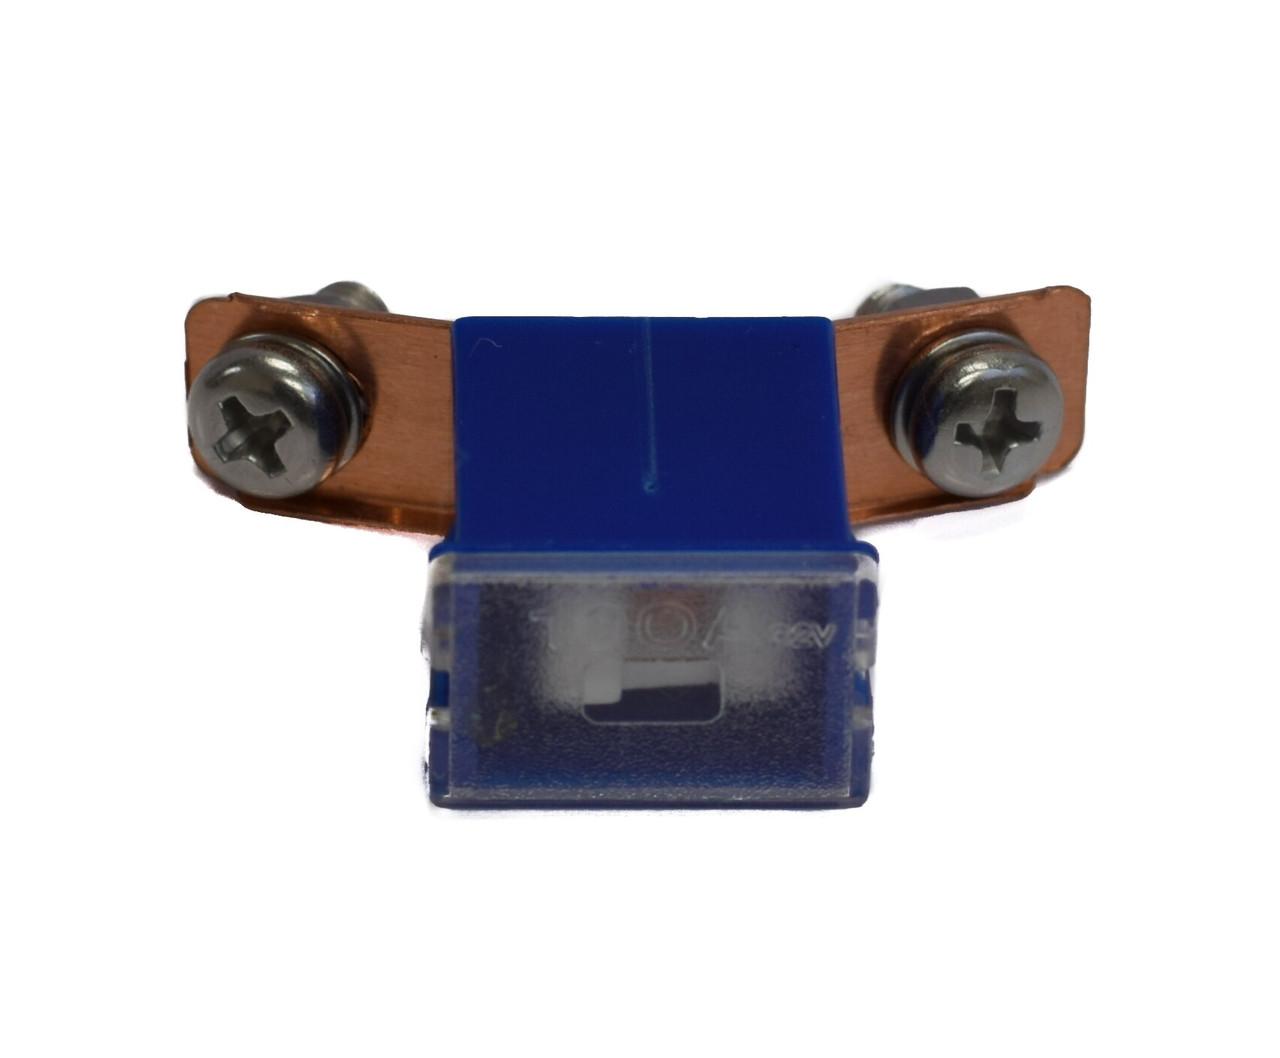 Raion Power RBC7 100A Fuse Includes Nuts & Bolts For APC RBC7